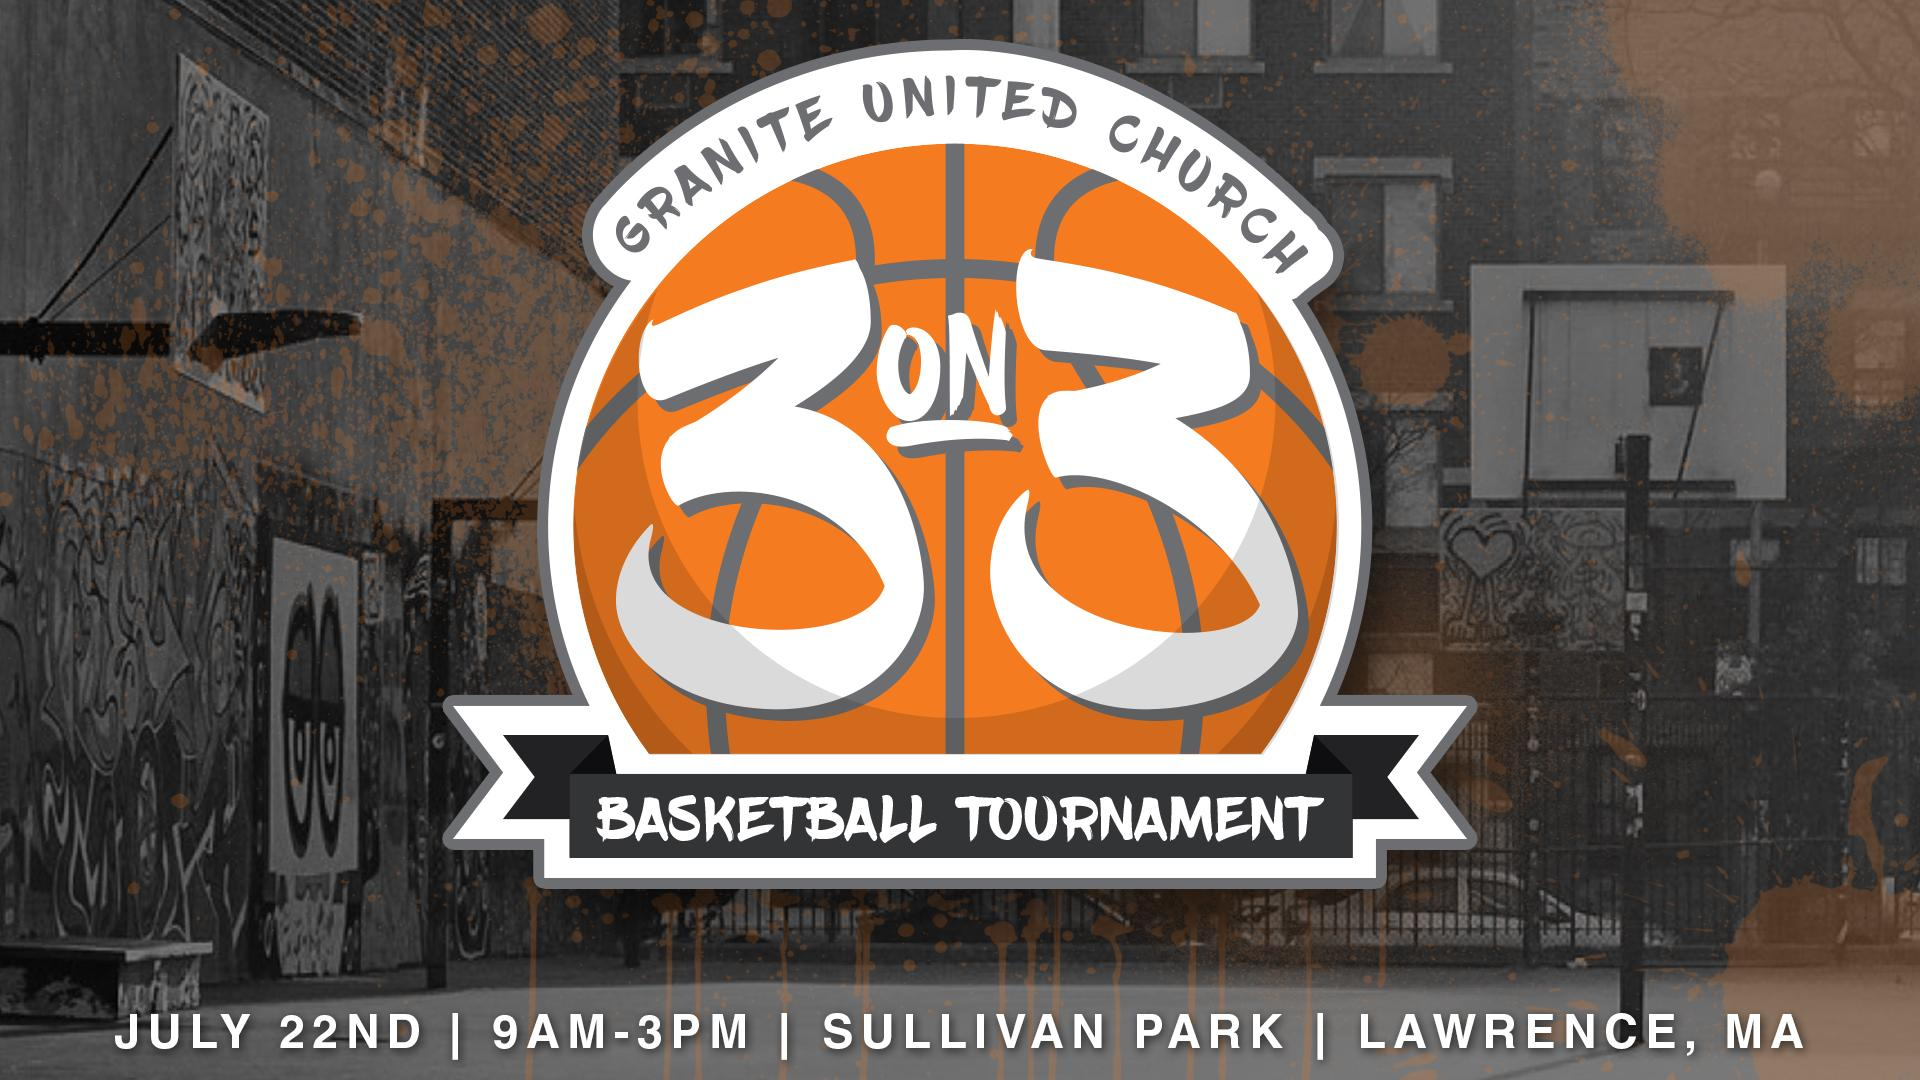 Volunteers: 3 on 3 Basketball Tournament